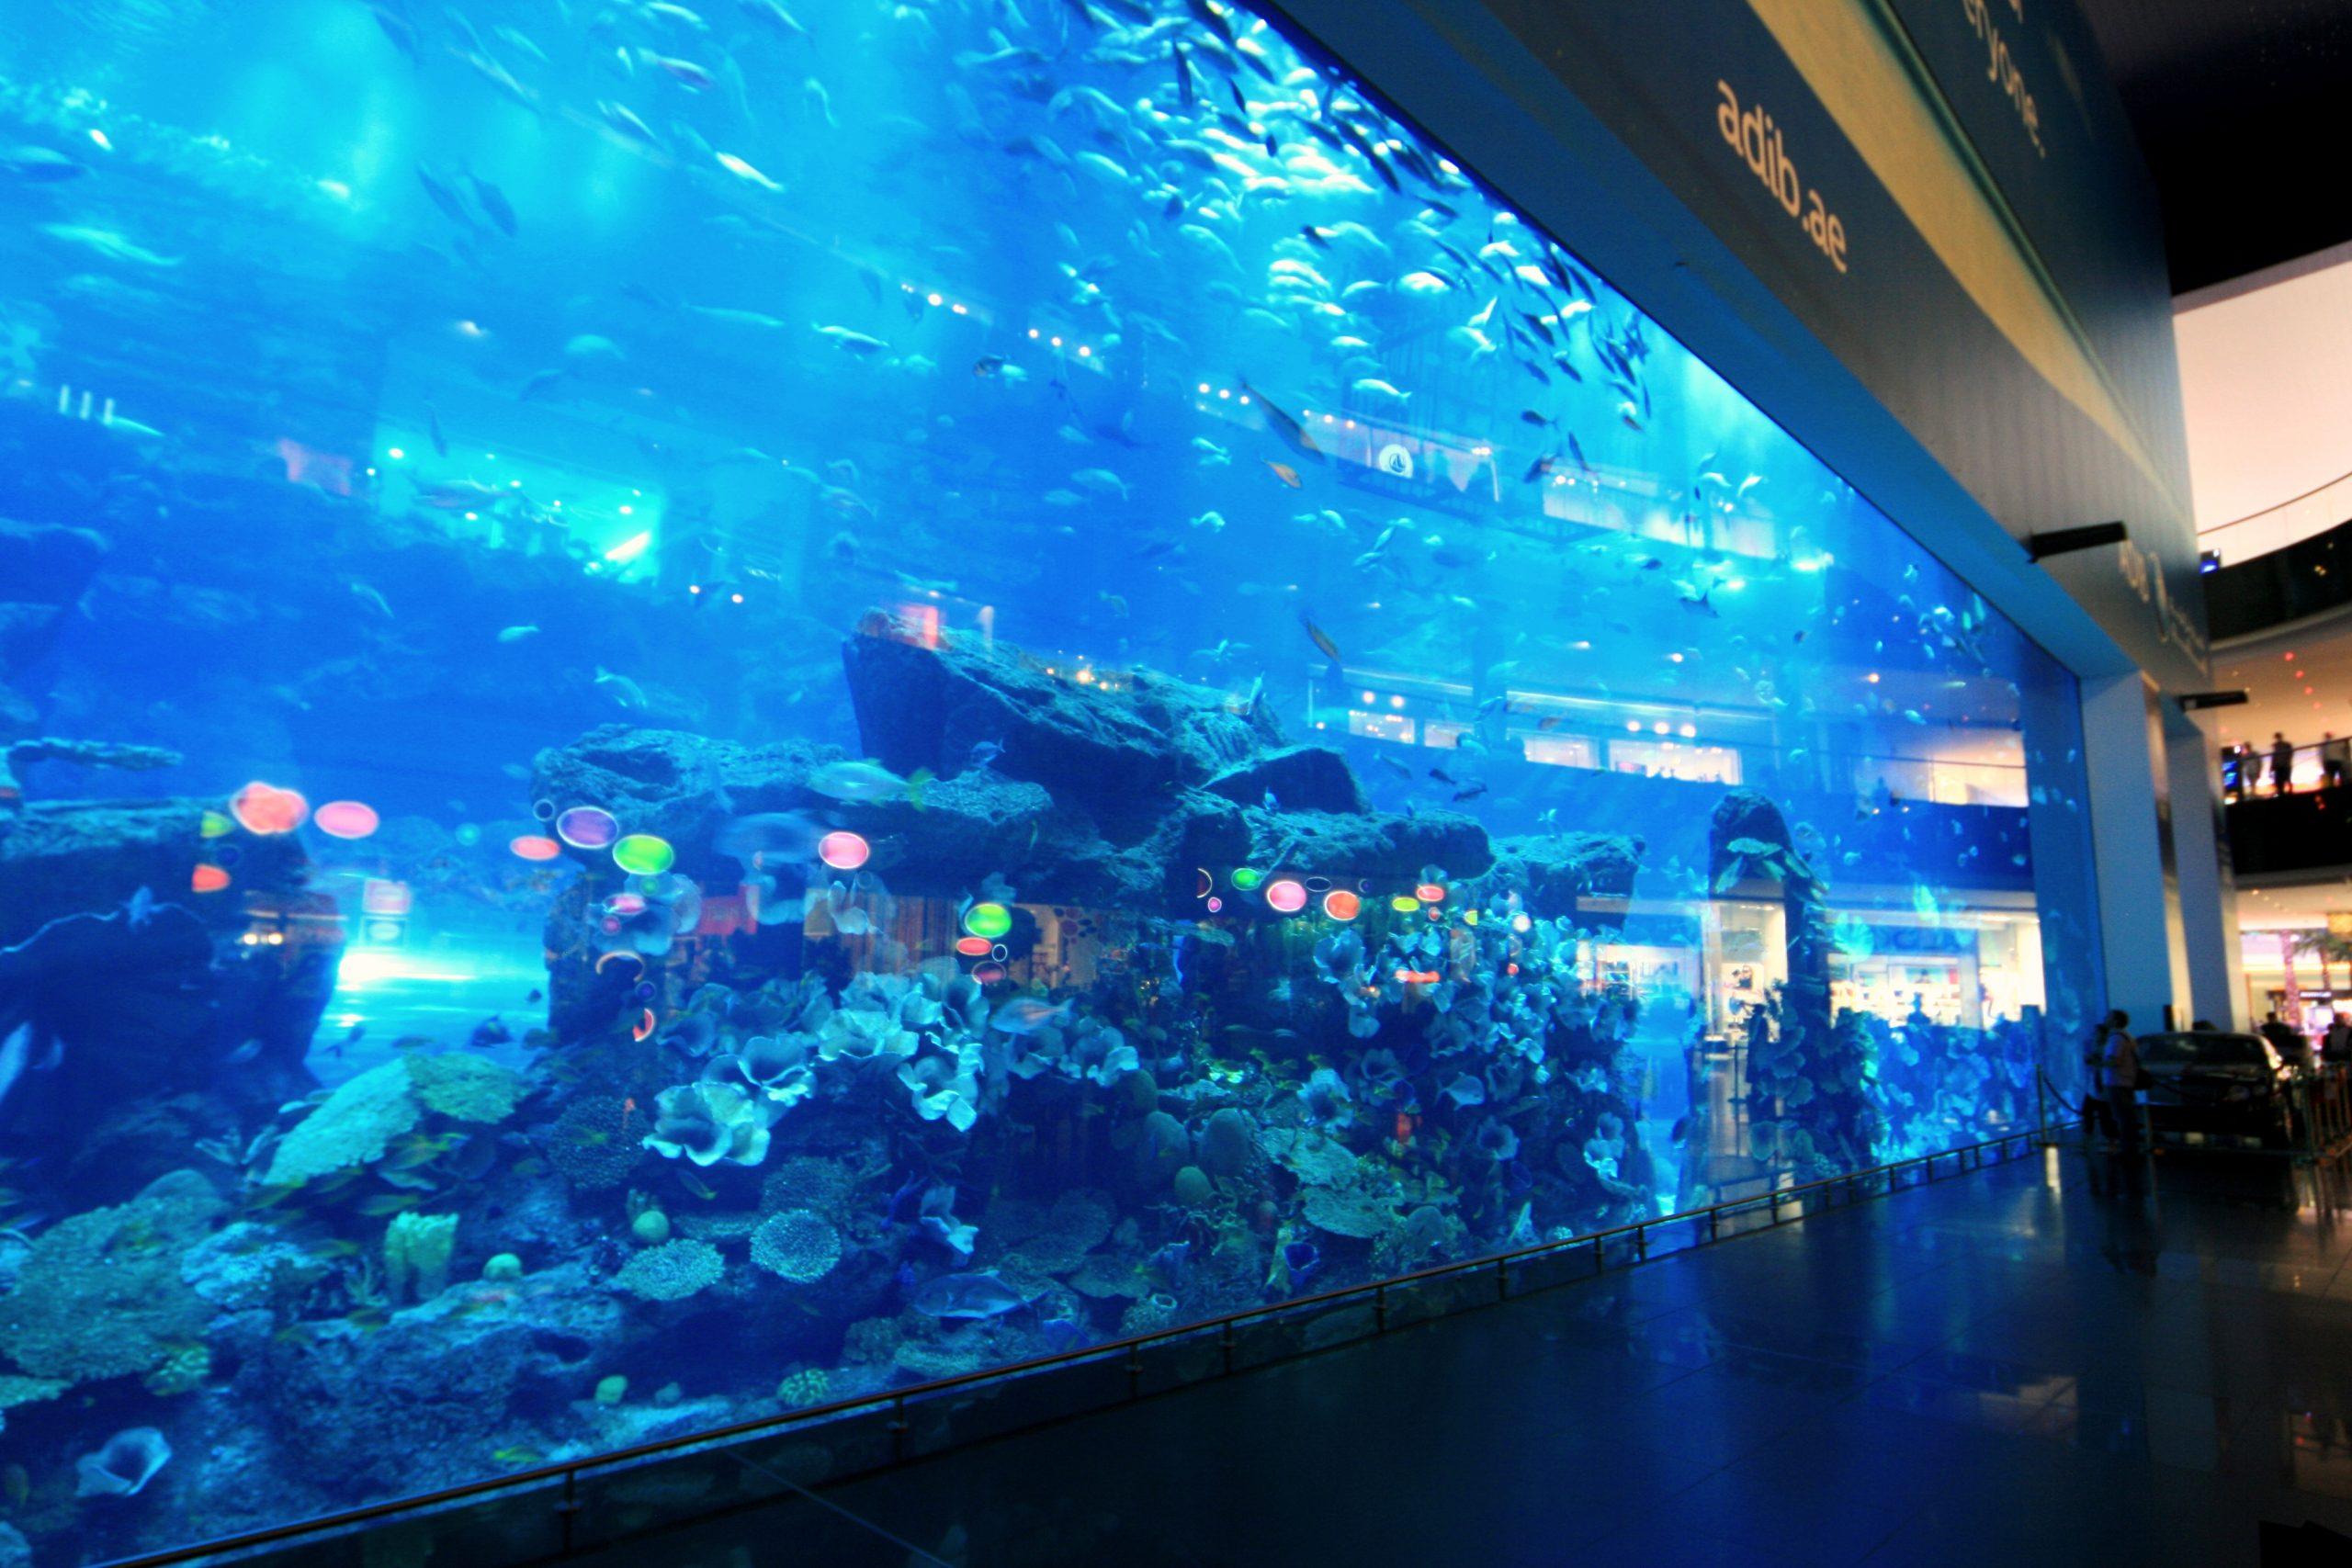 dubai aquarium - إكواريوم دبي (3)